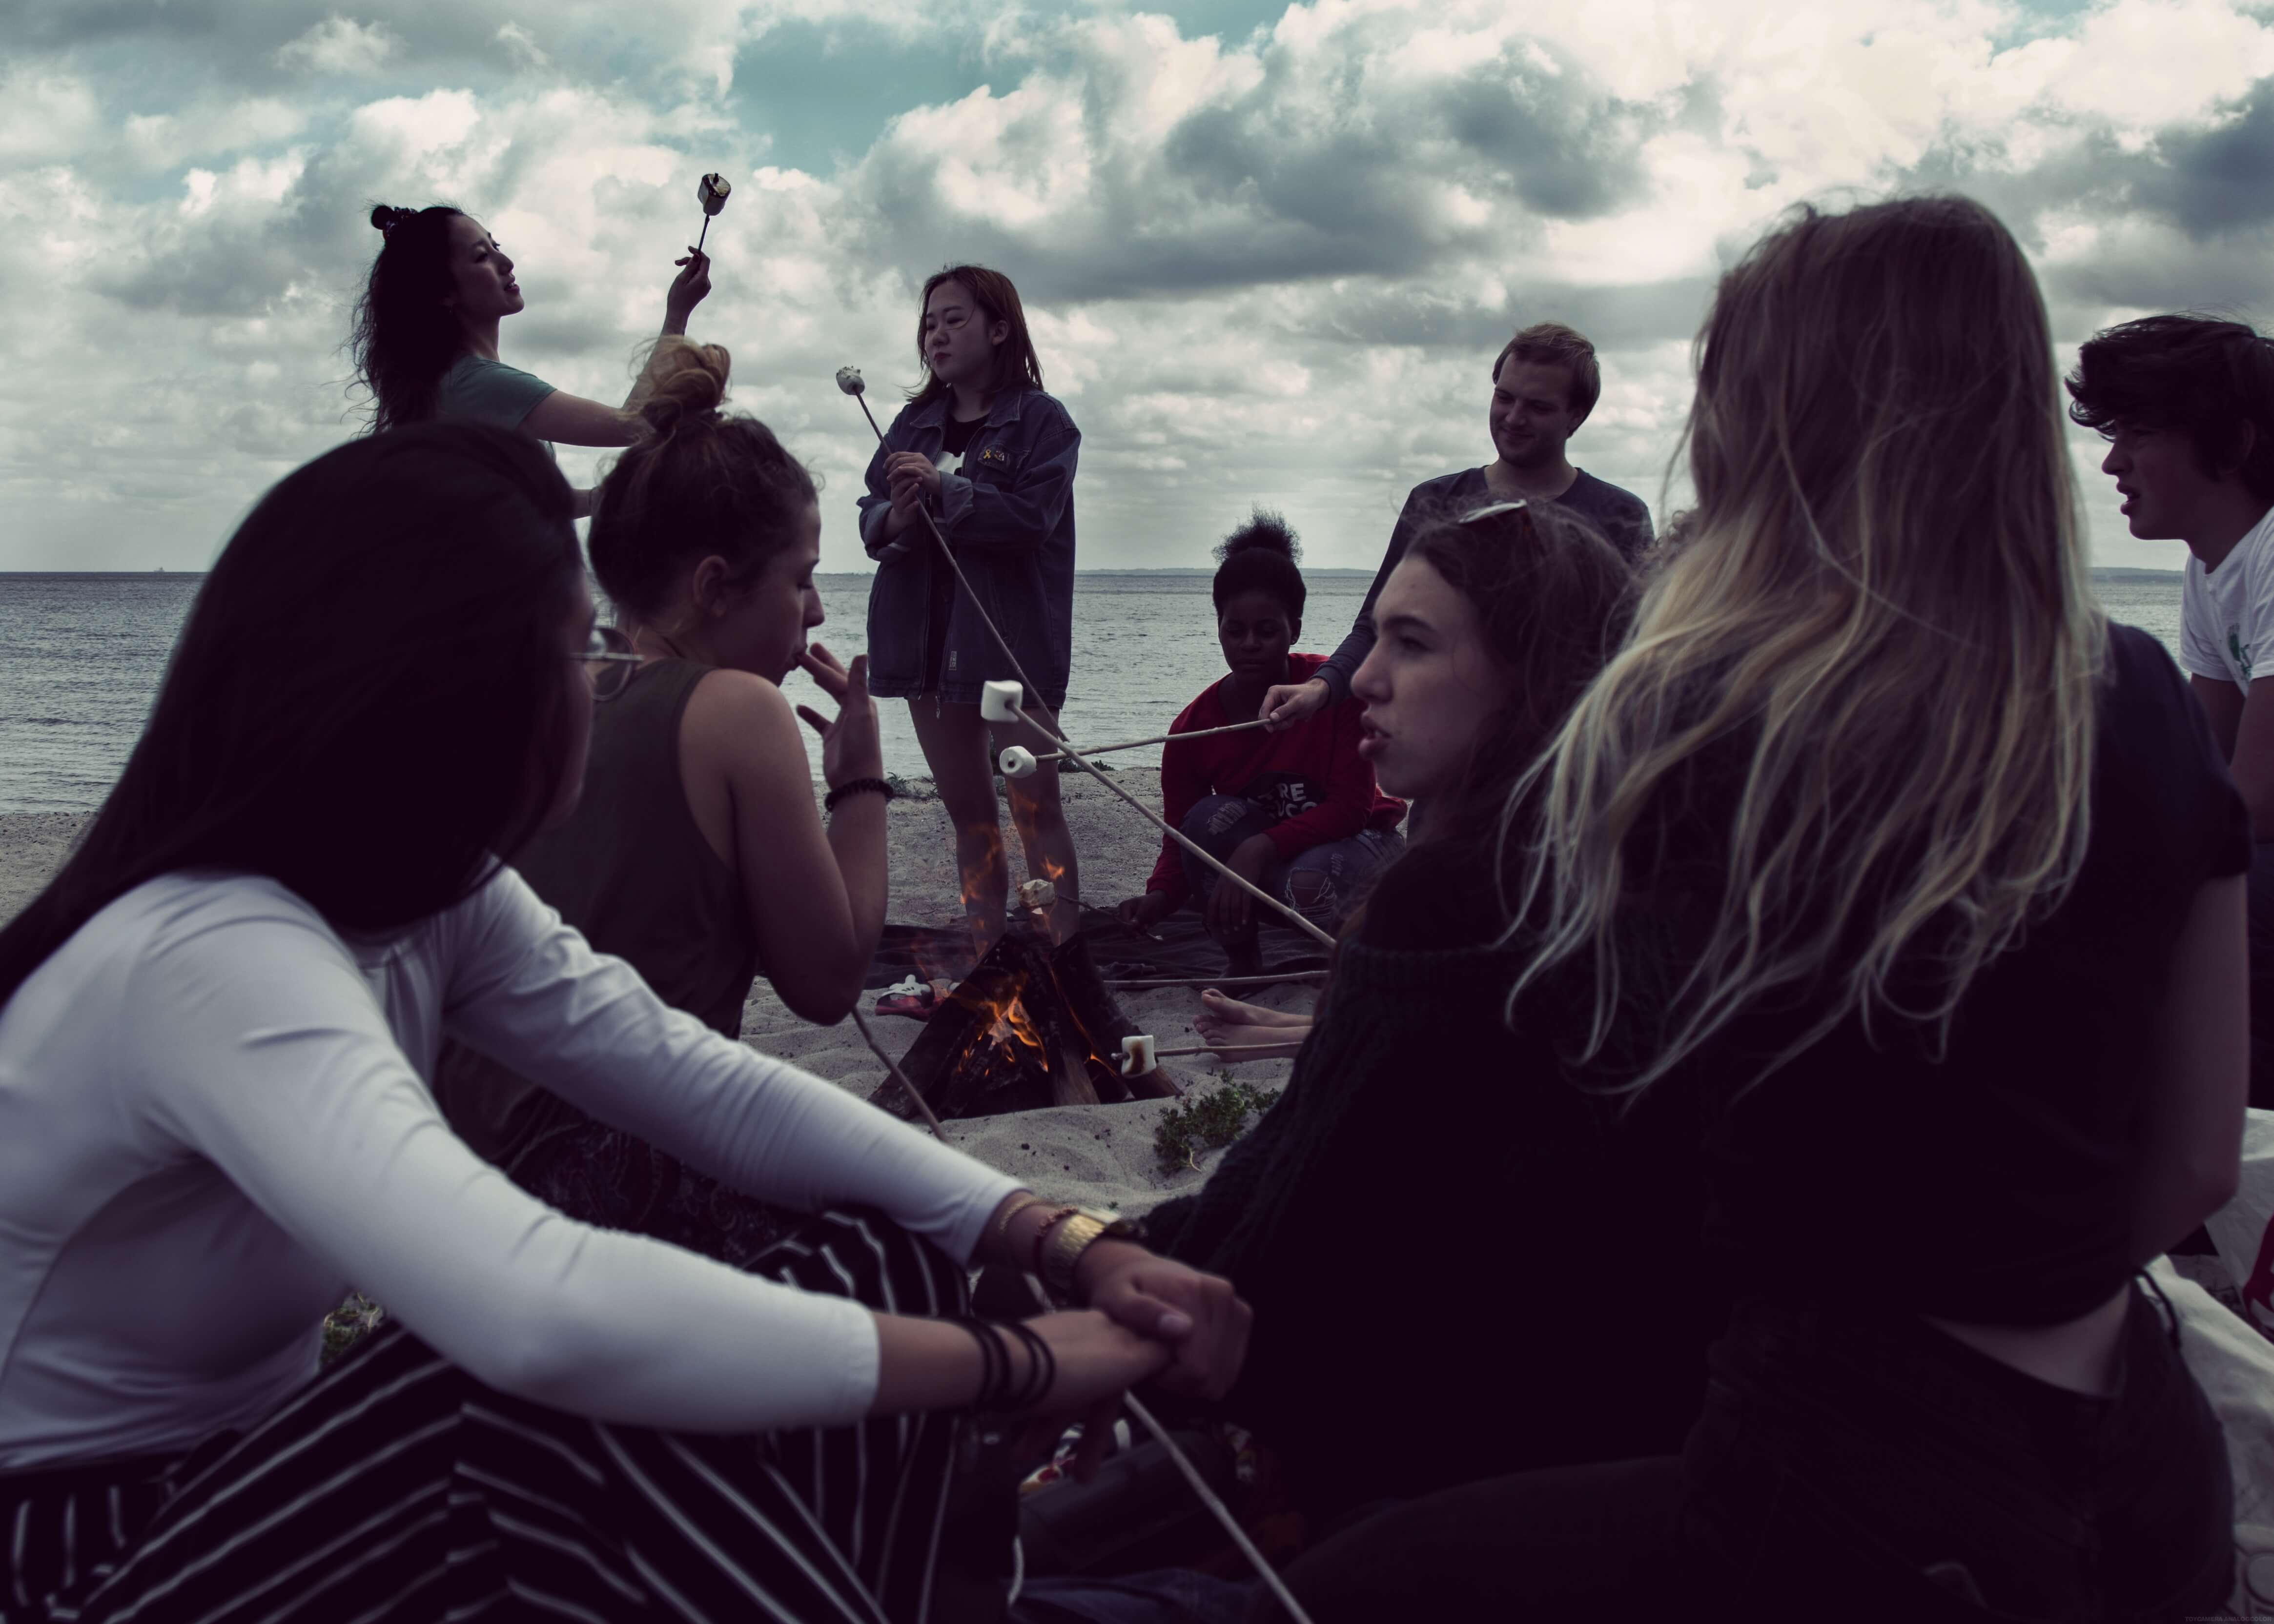 Folk High School Activity at International People's College in Denmark beach trip 2